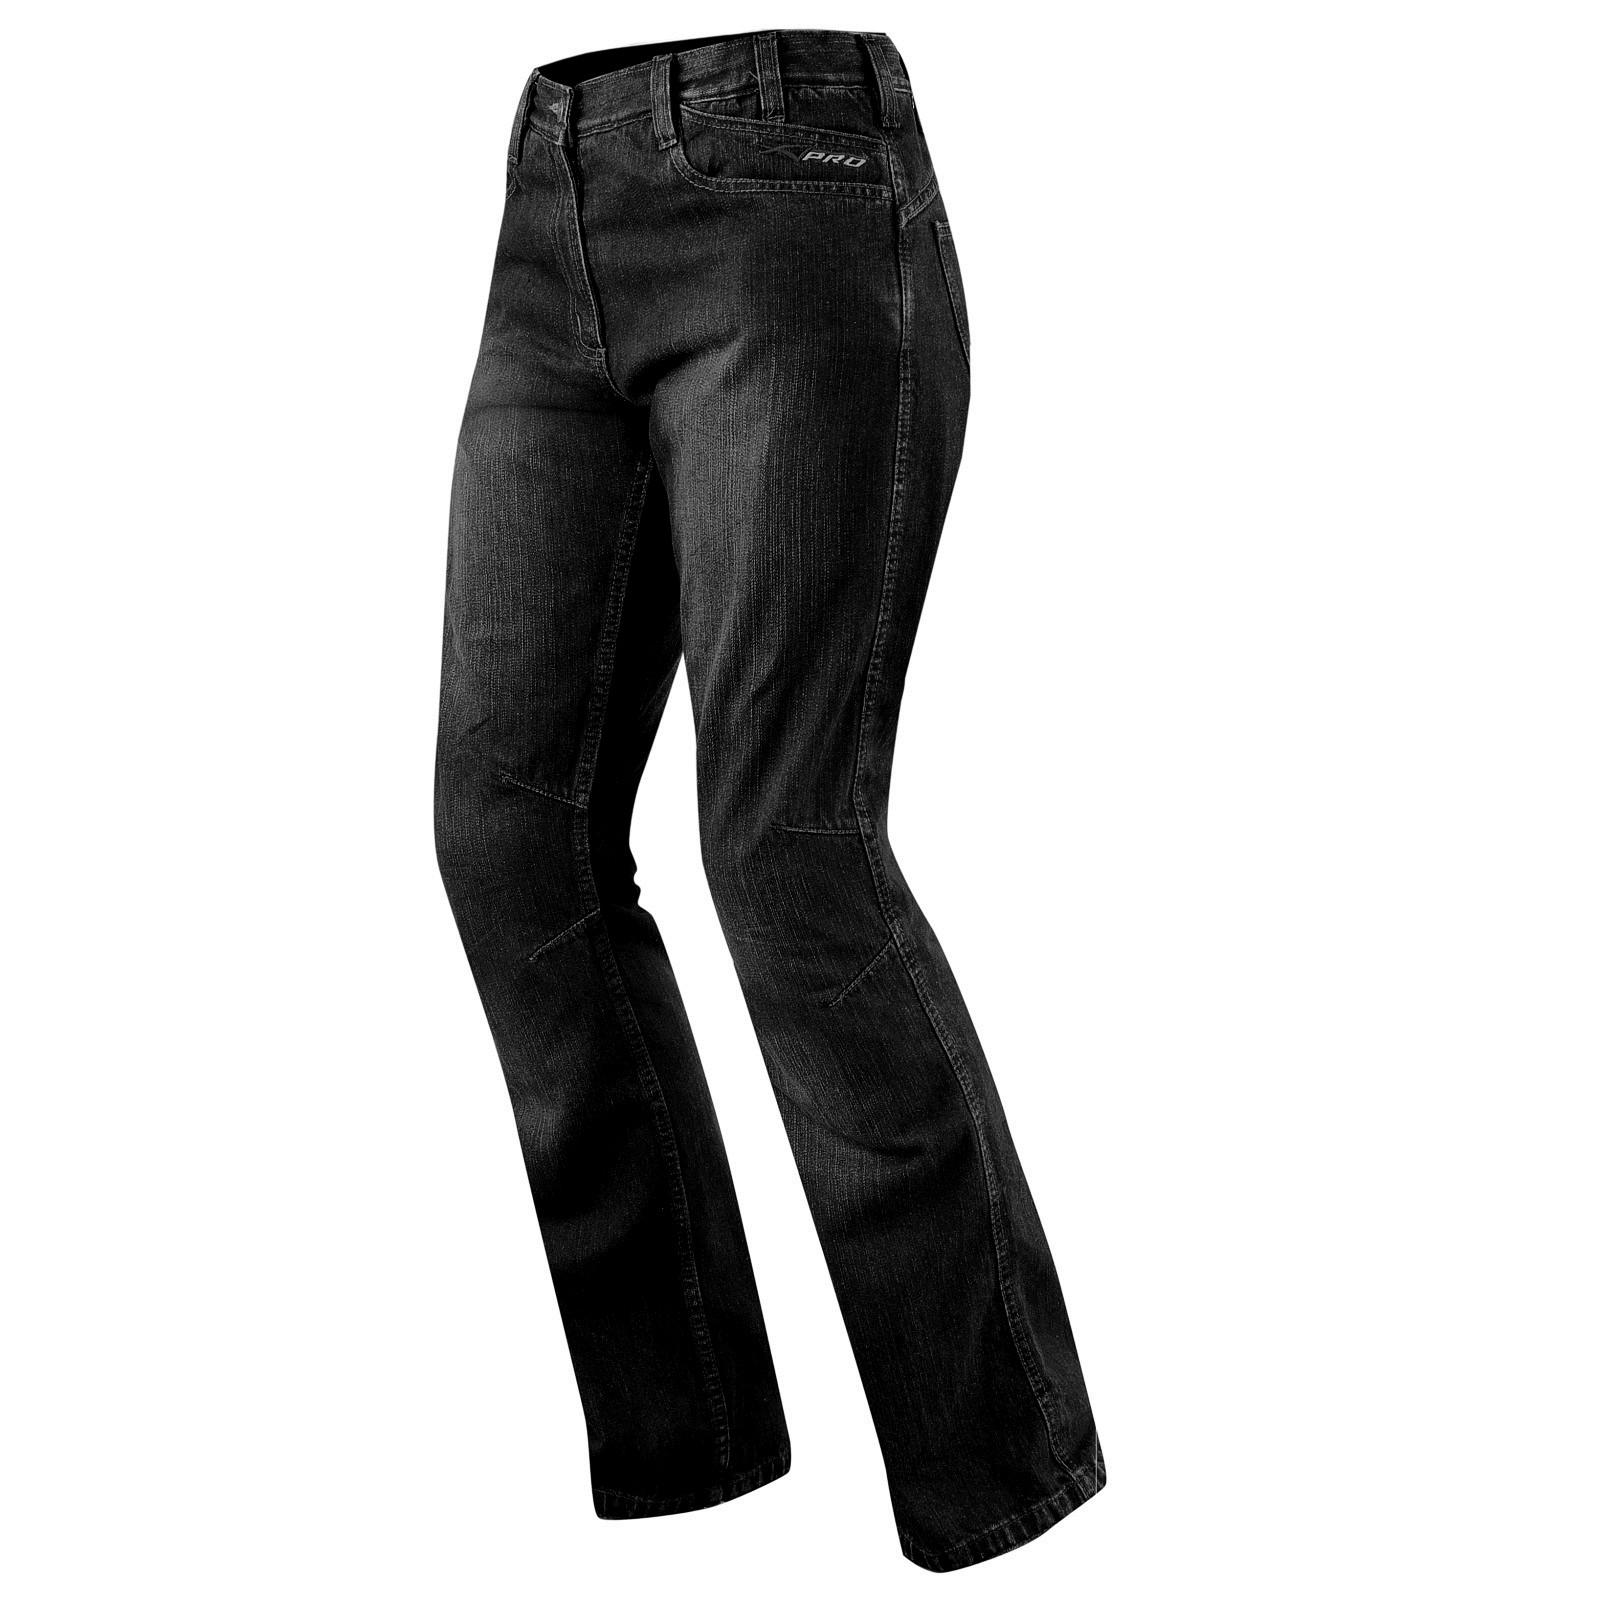 Jeans Donna Protezioni CE Ginocchio Pantaloni Lady Moto Scooter Custom Nero